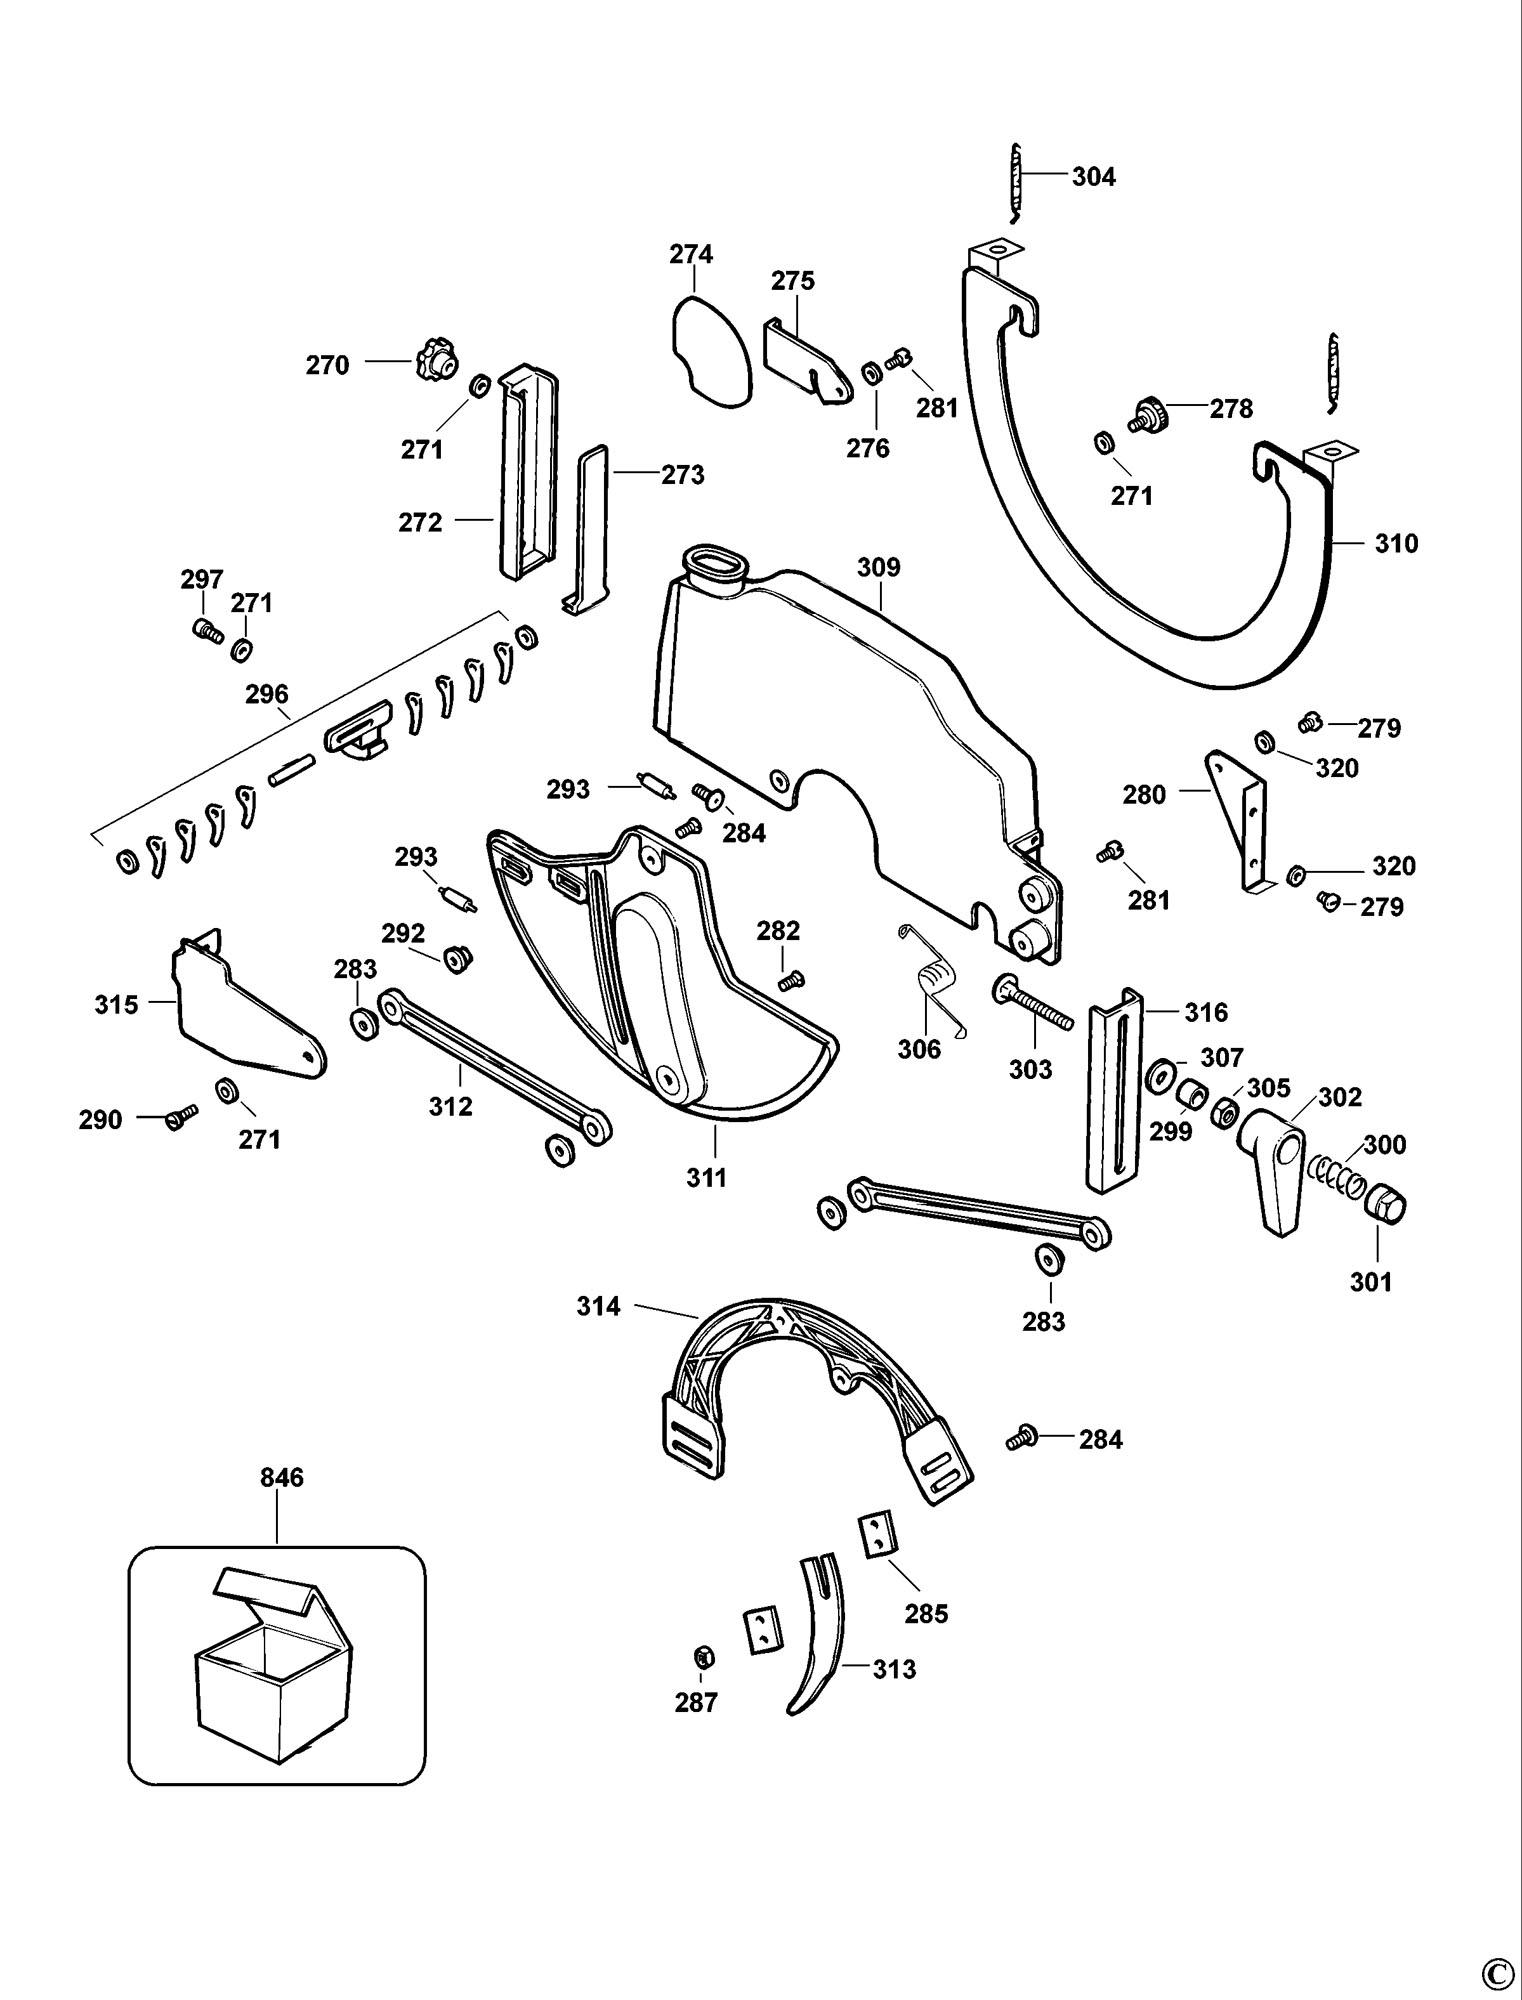 Spares for Dewalt Dw721 Radial Arm Saw (type 3) SPARE